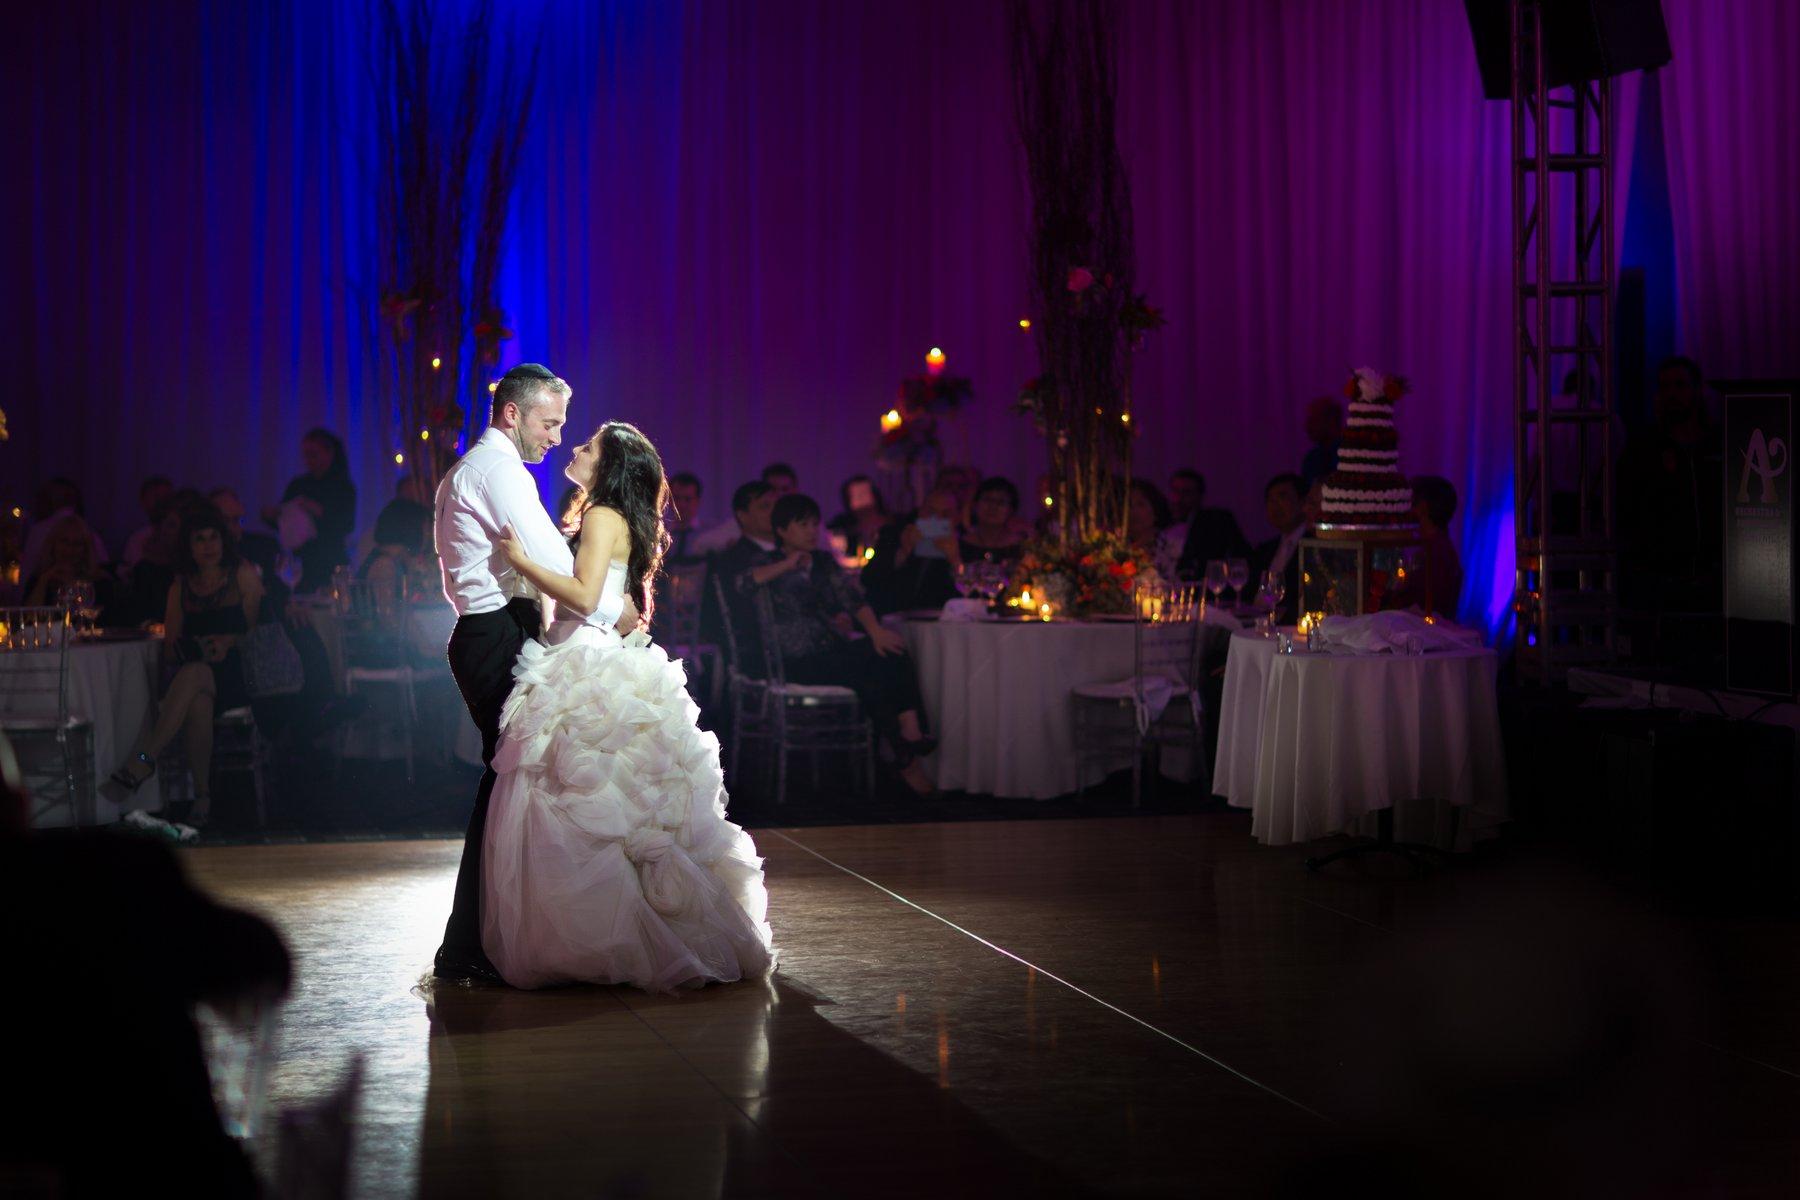 ortodox jewish wedding first dance